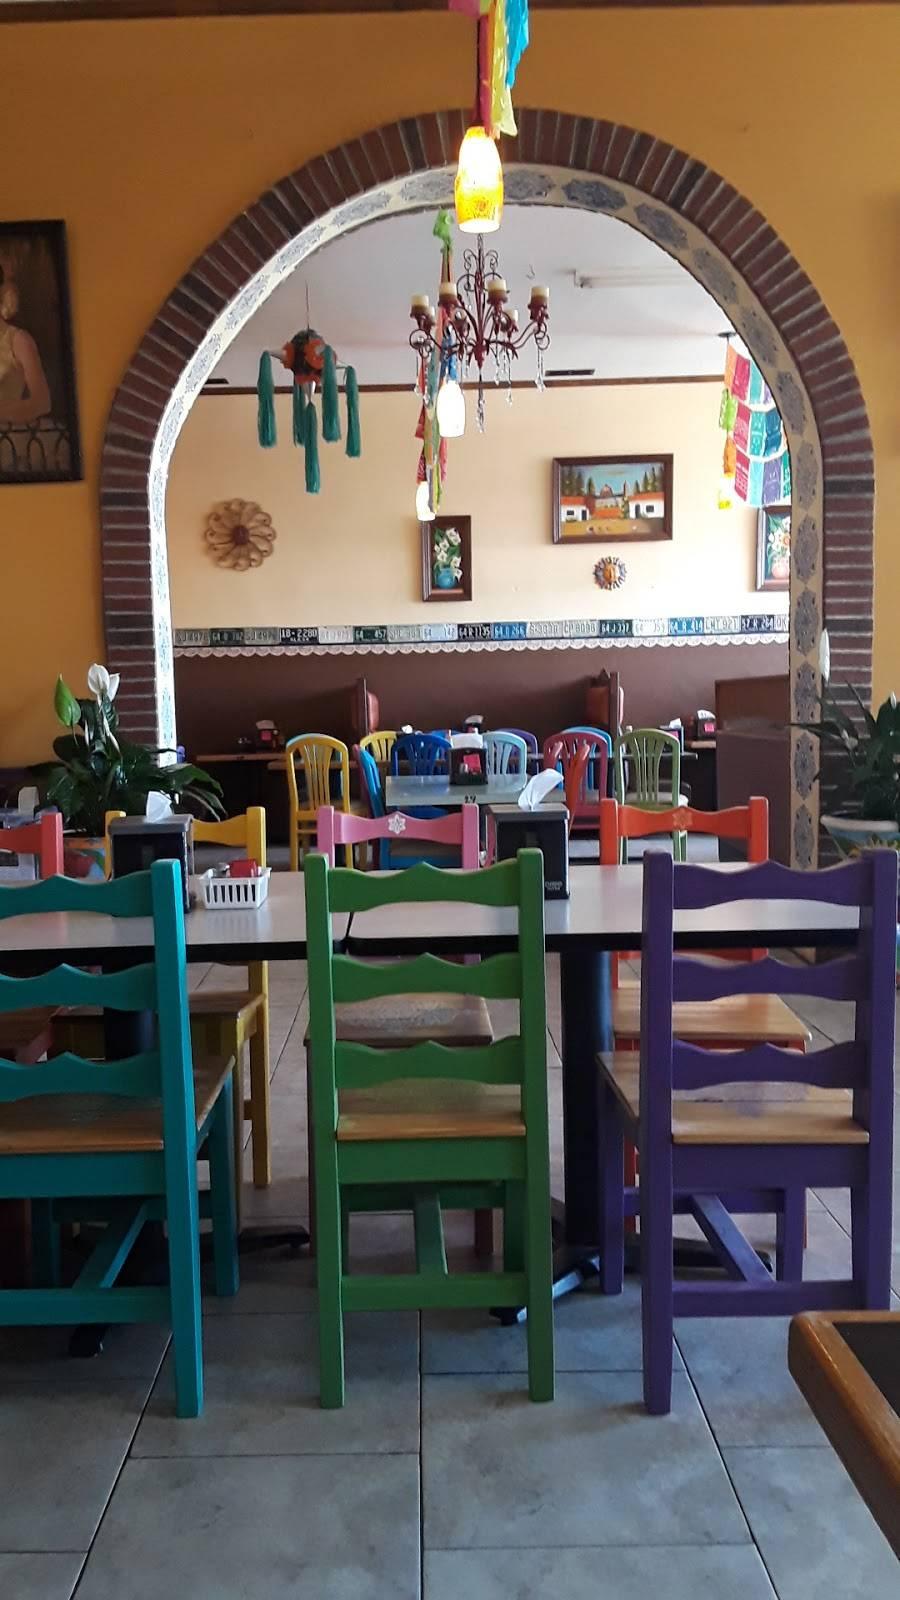 Santa Fe Mexican Restaurant | restaurant | 30 W Alabama St, Tallapoosa, GA 30176, USA | 7705749224 OR +1 770-574-9224